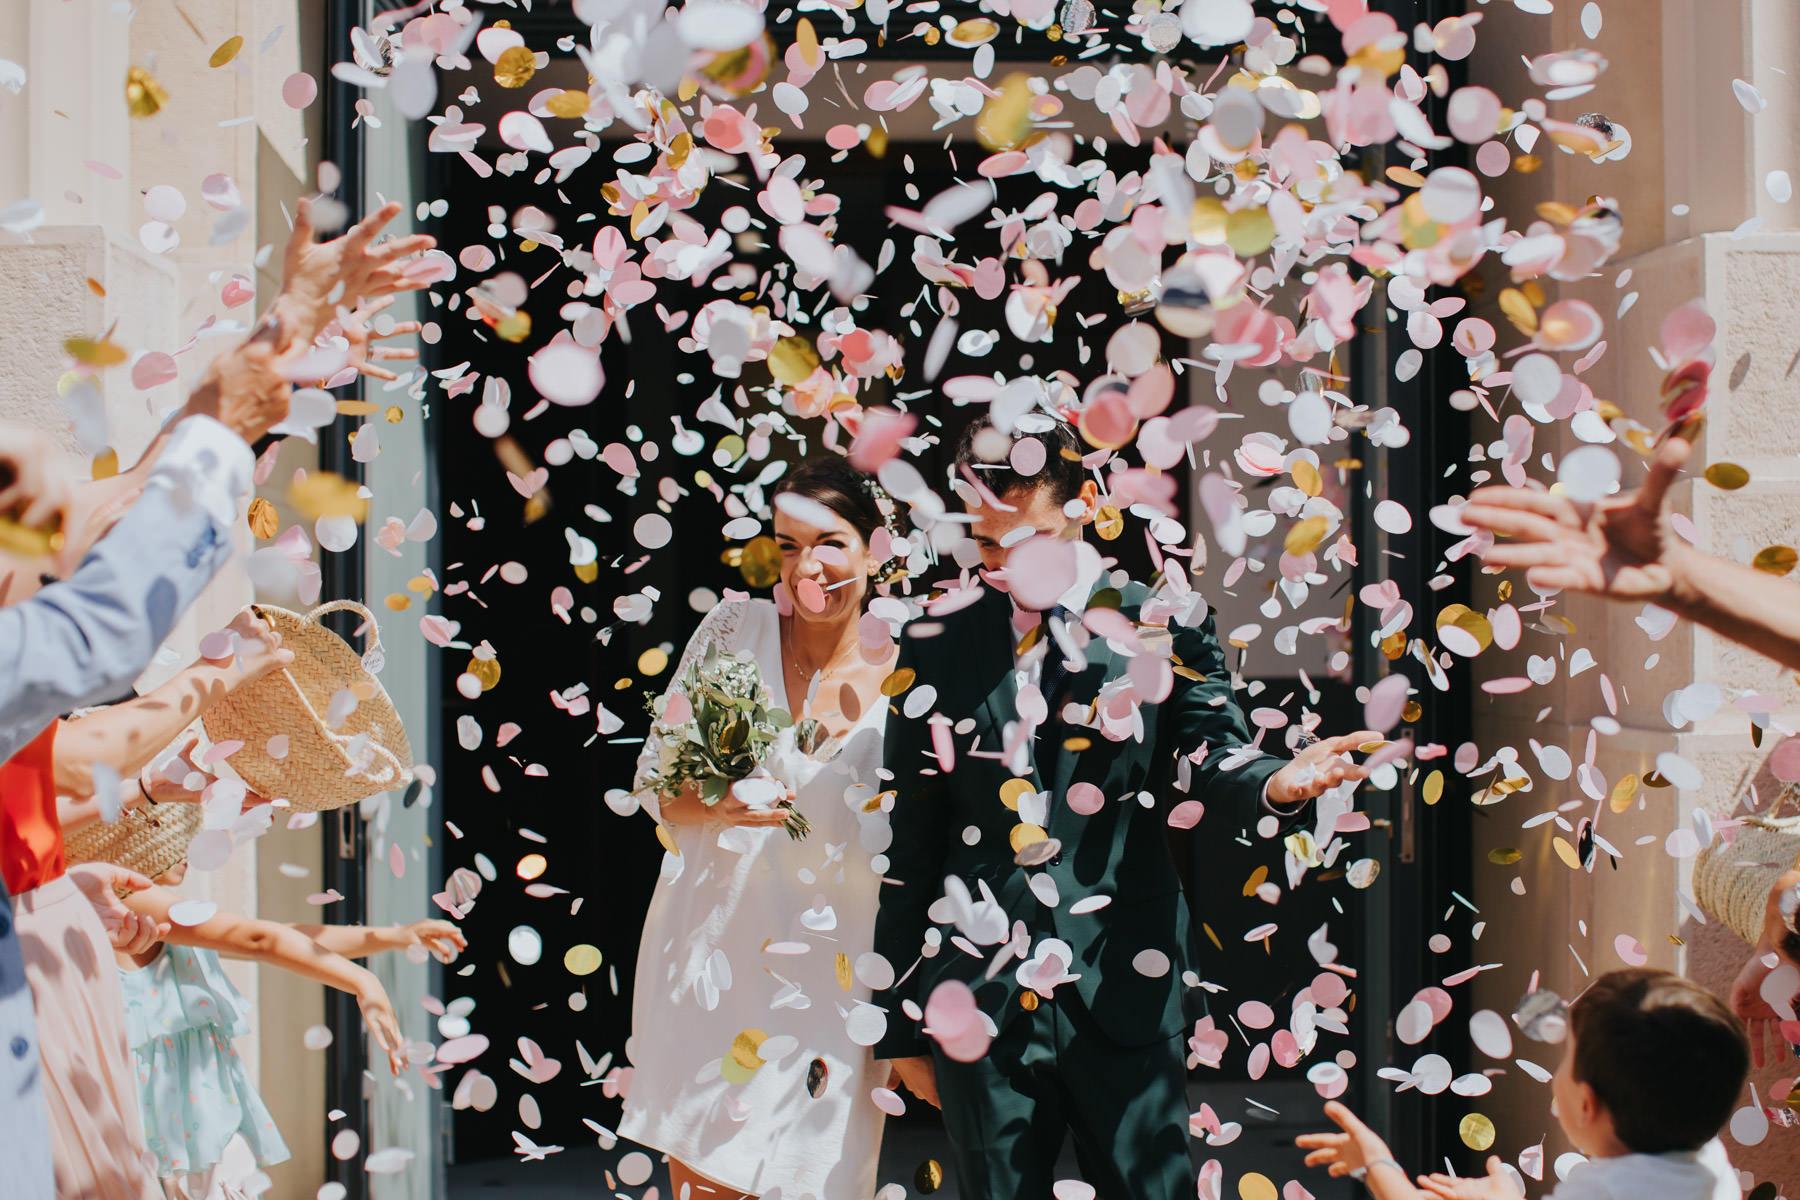 Cérémonie Mariage Civil à Nice